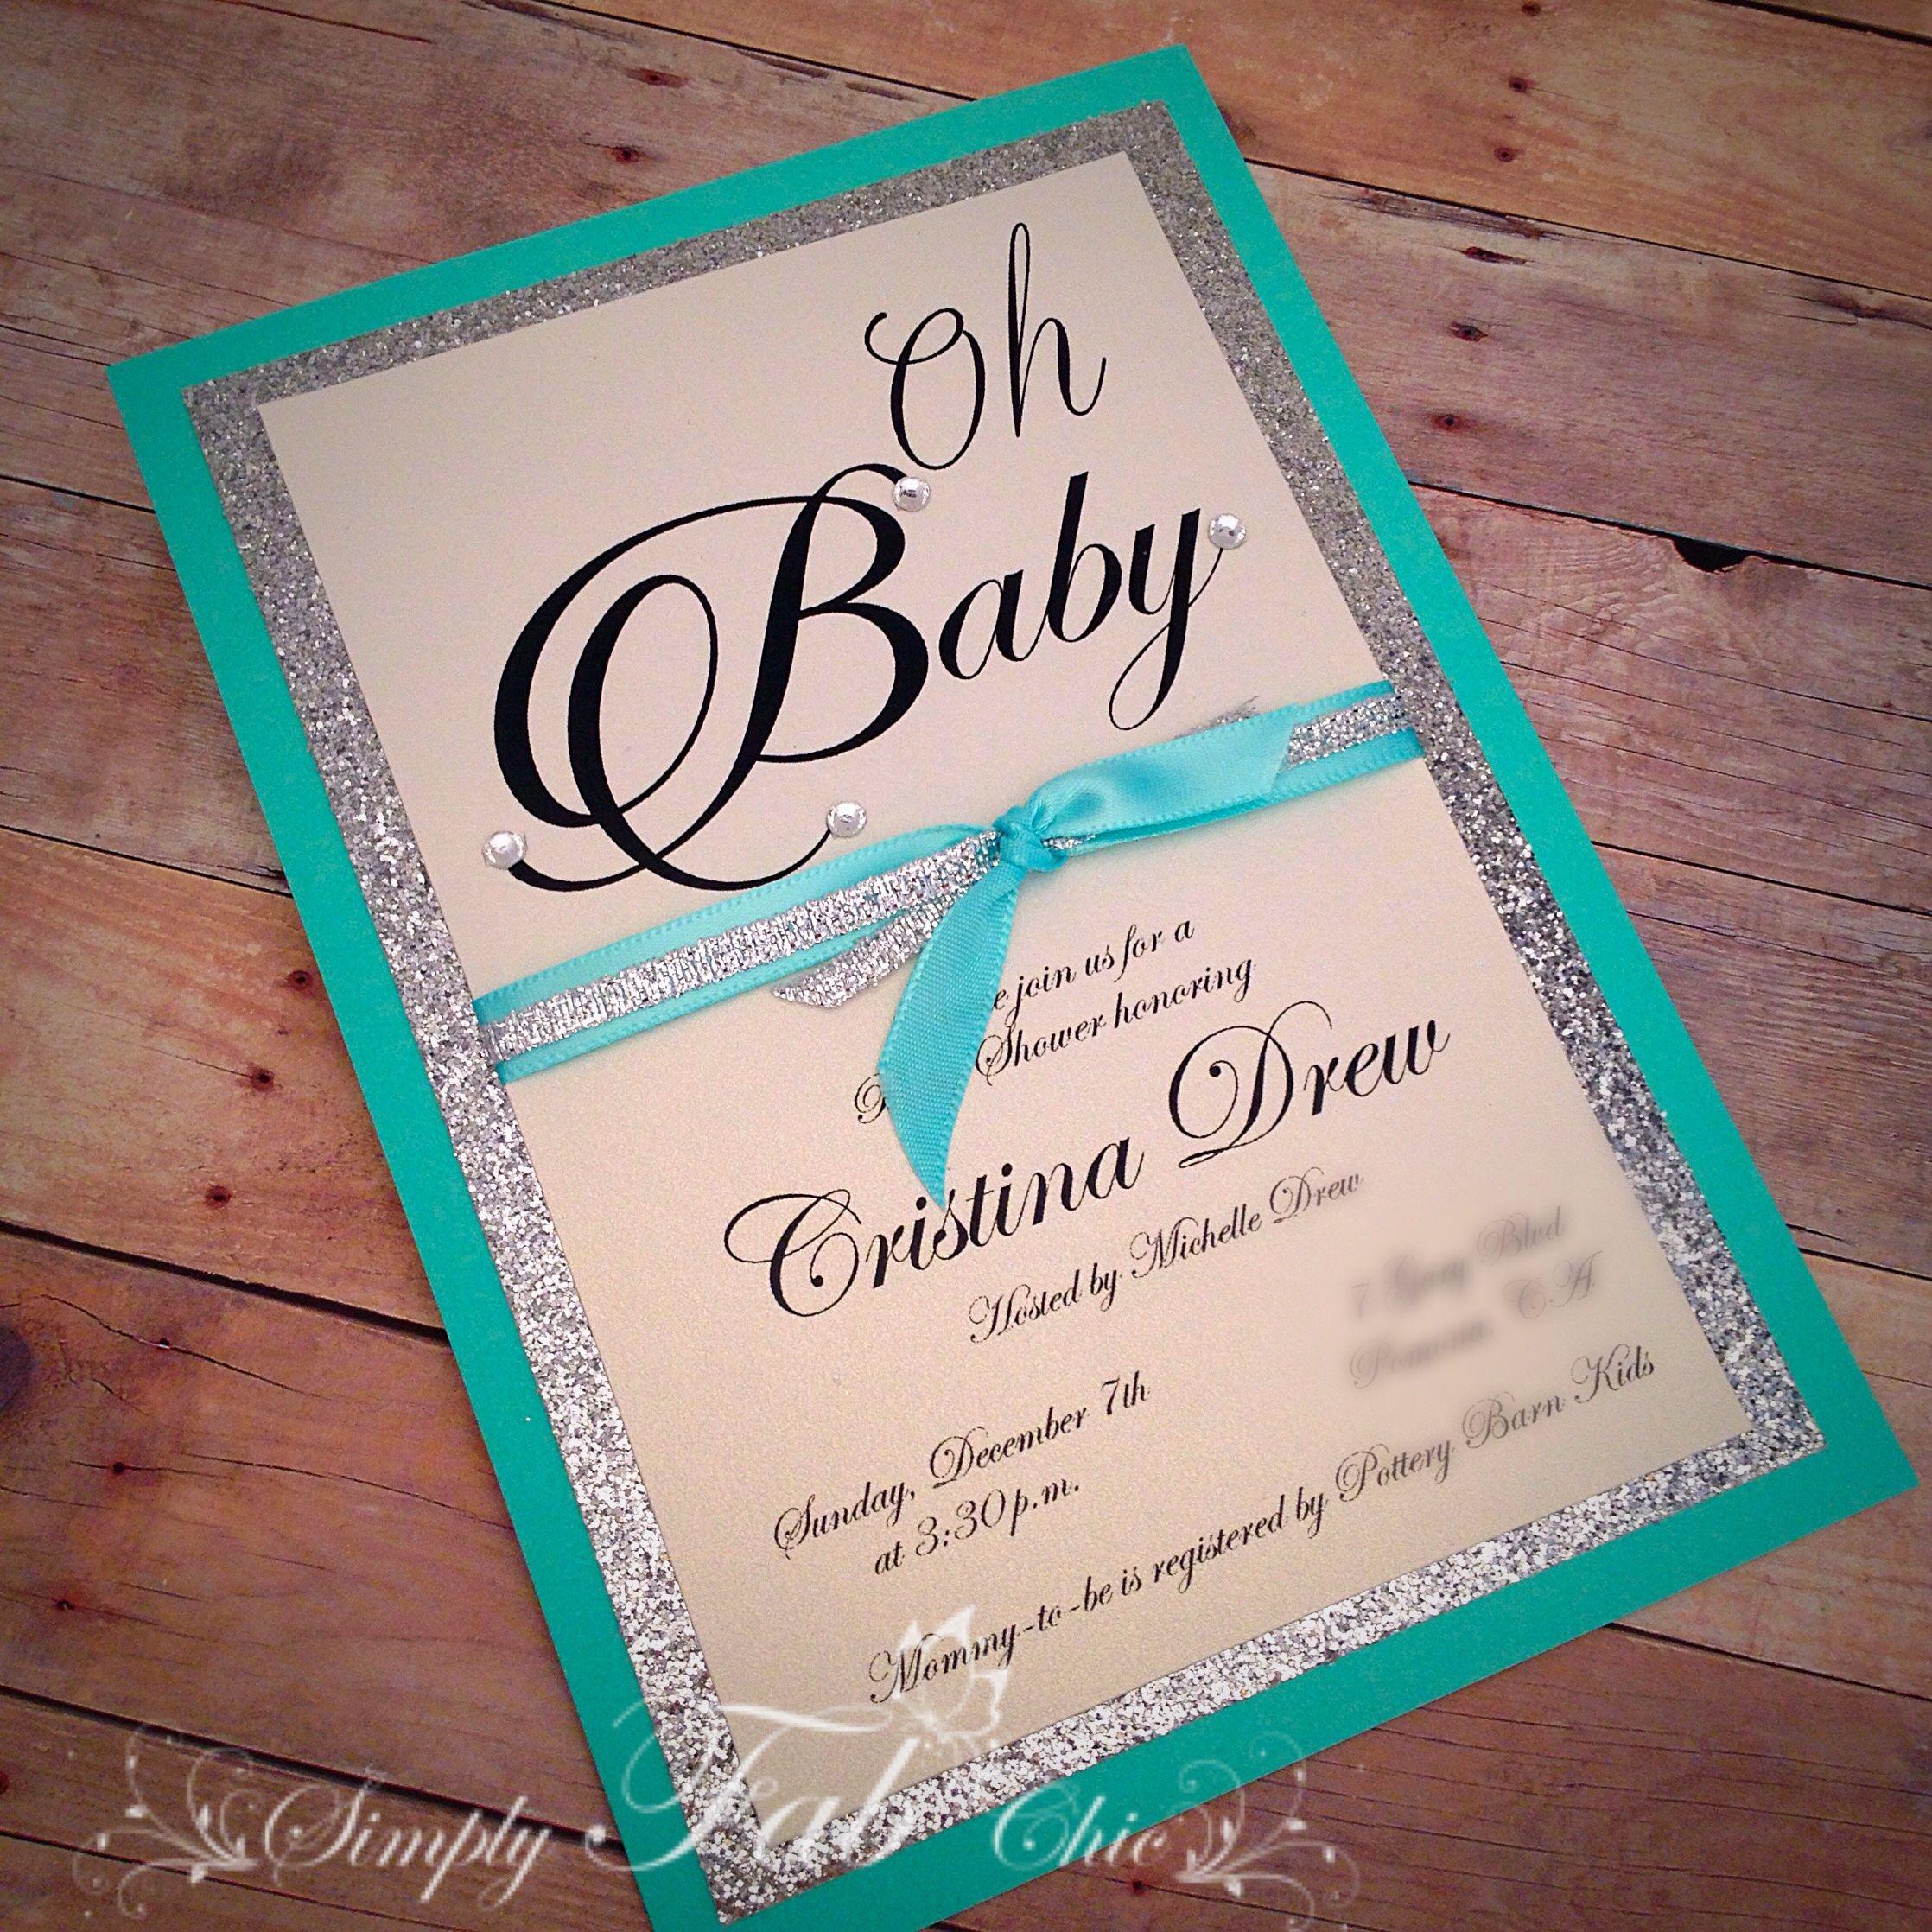 Custom Handmade Tiffany Turquoise & Silver Glitter Baby Shower